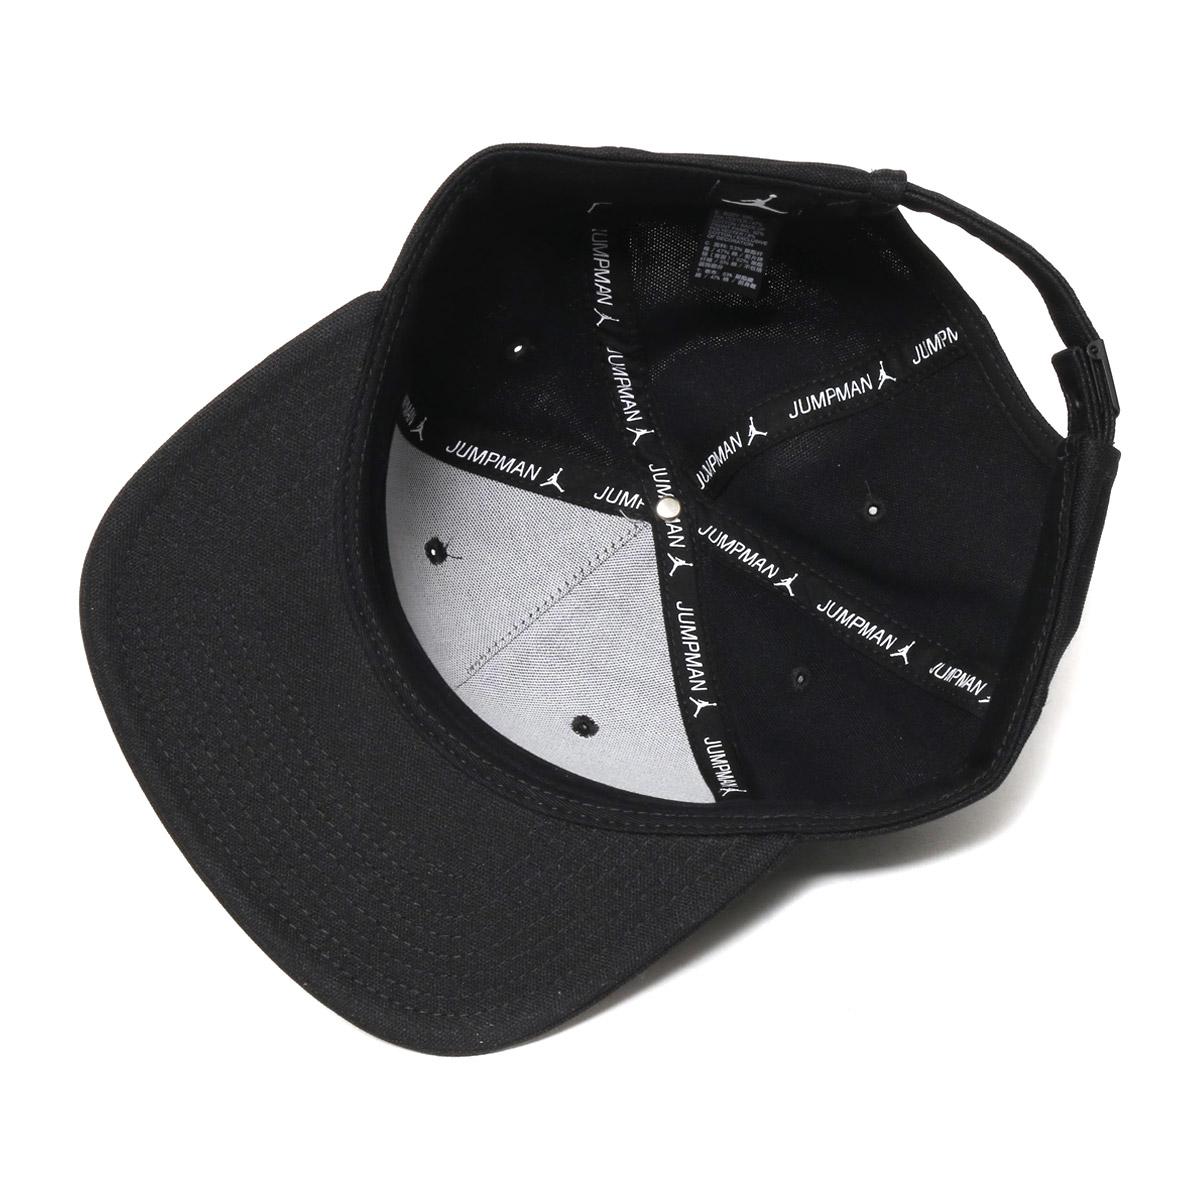 NIKE JORDAN WINGS STRAPBACK (Jordan WINGS strap back cap) BLACK WHITE 17FA-I 21ed95ba972